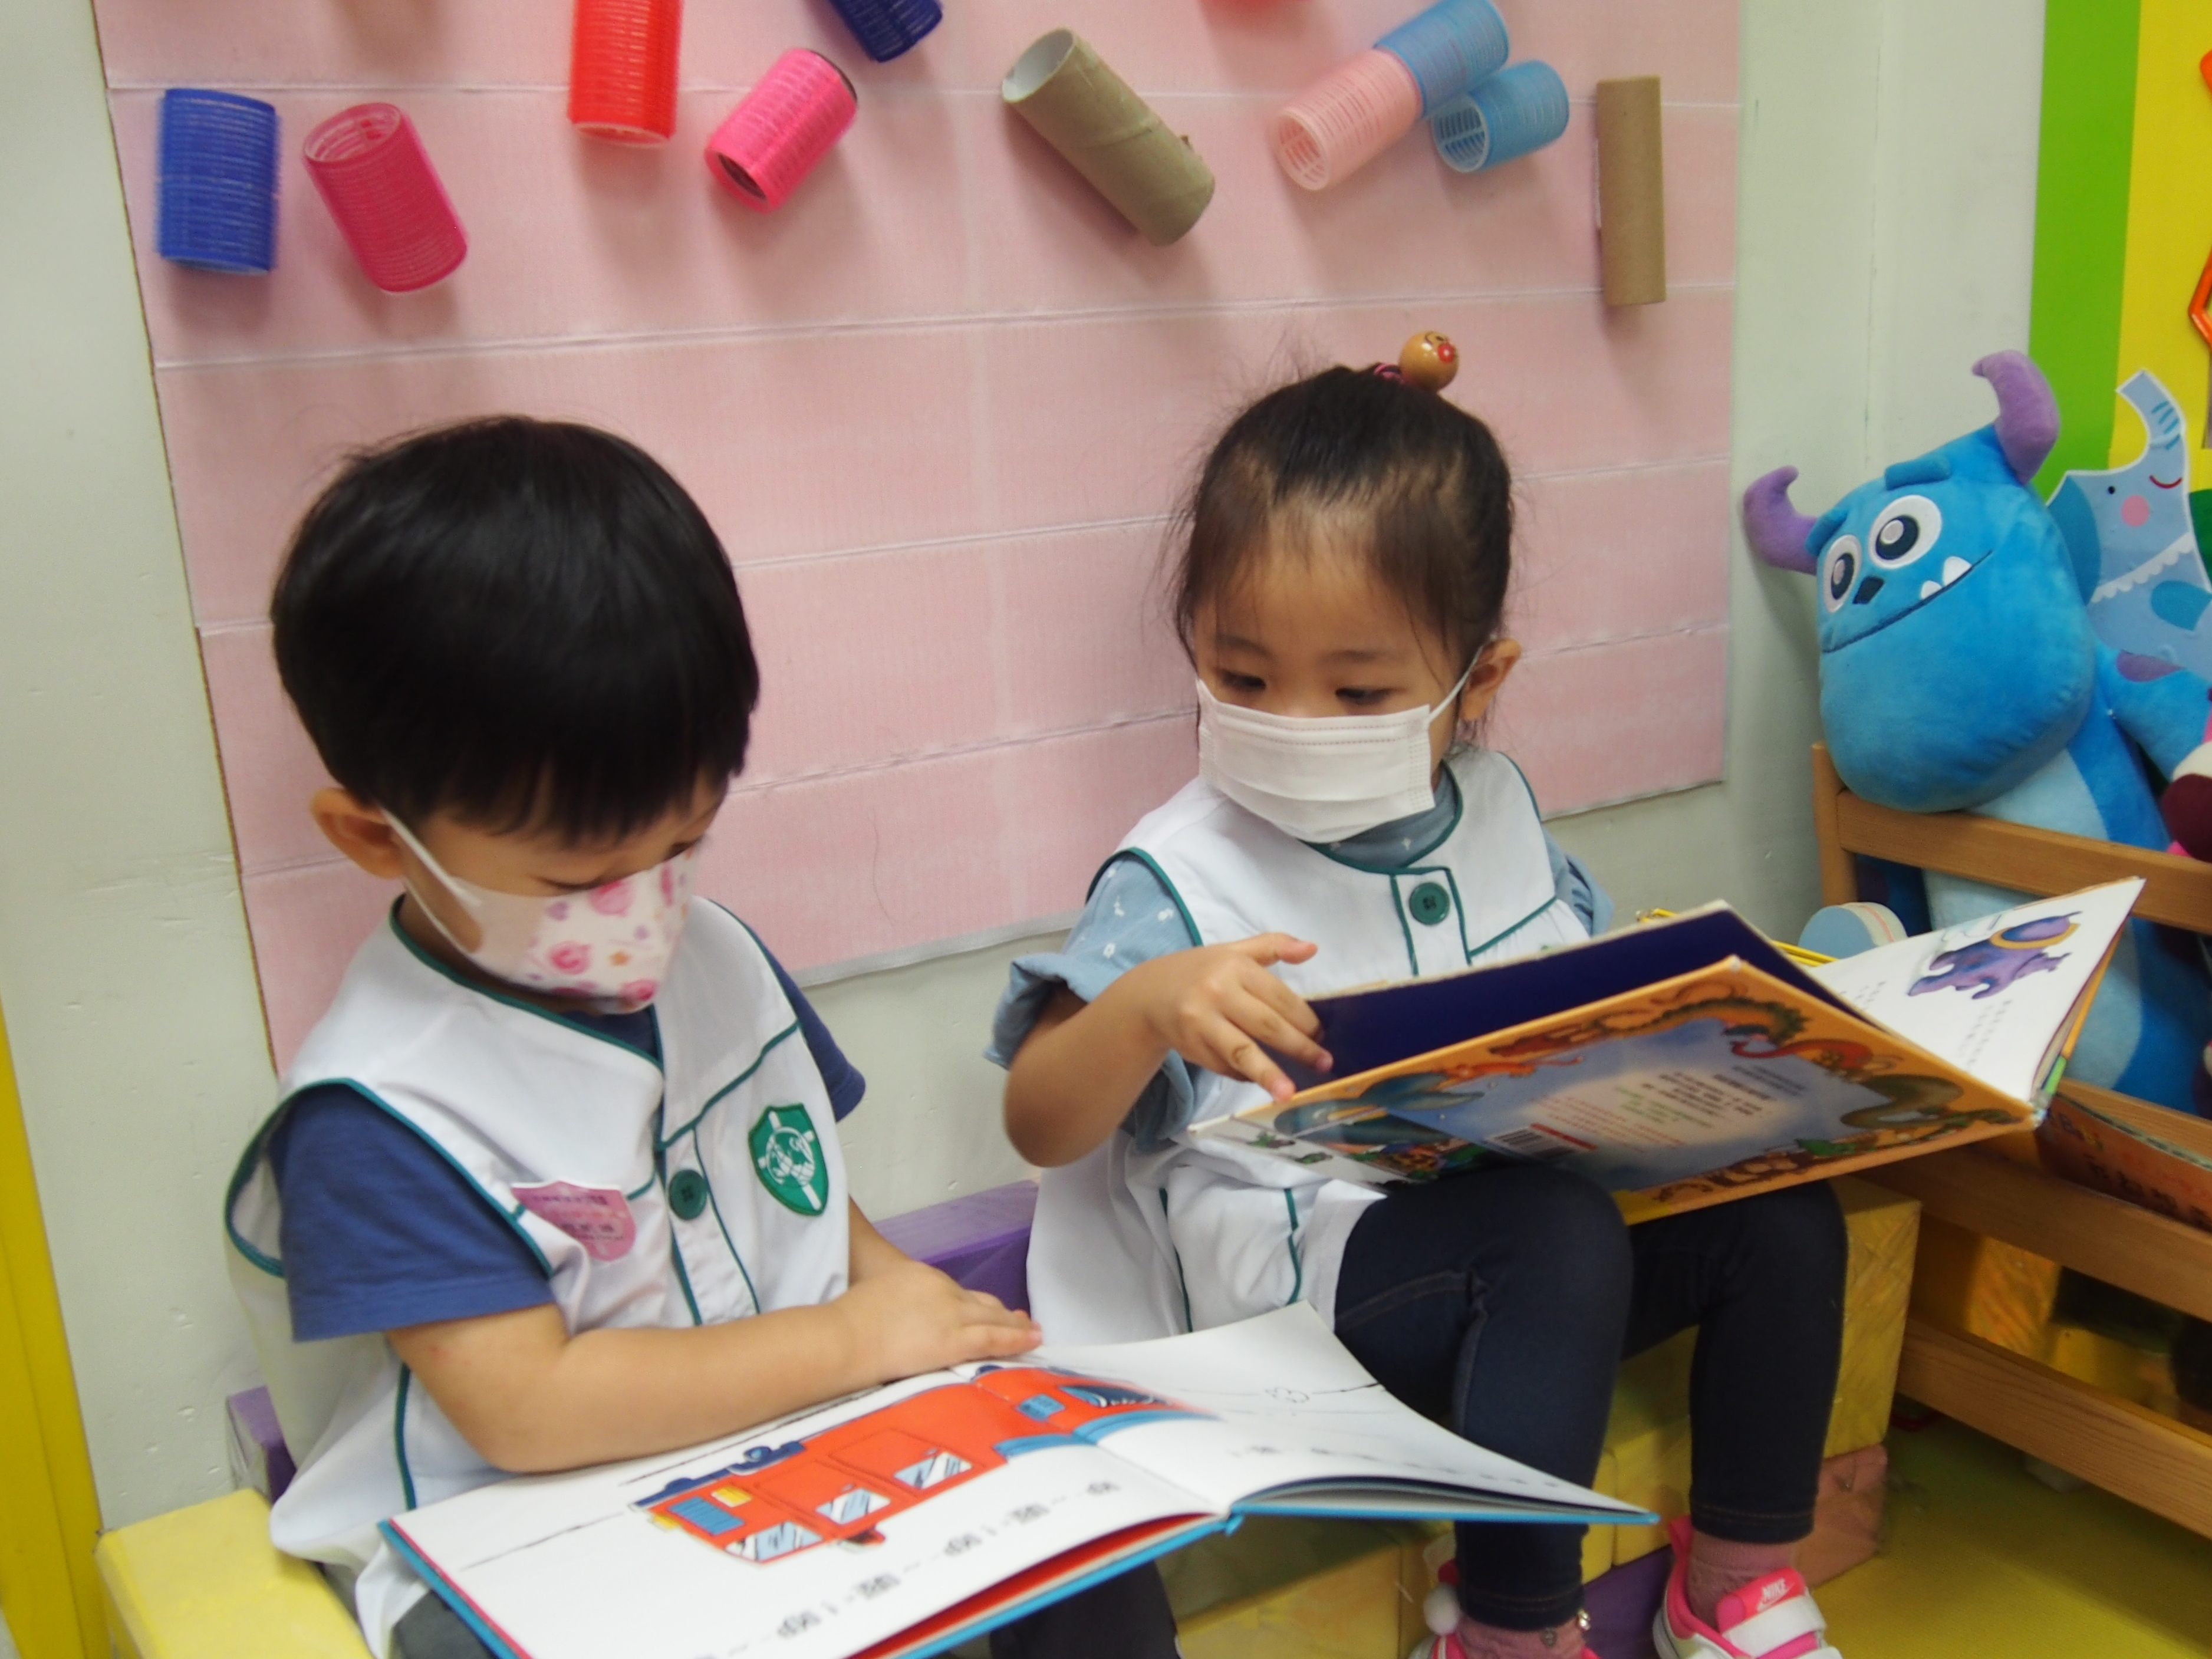 http://npmc.edu.hk/sites/default/files/feng_mian_a.jpg